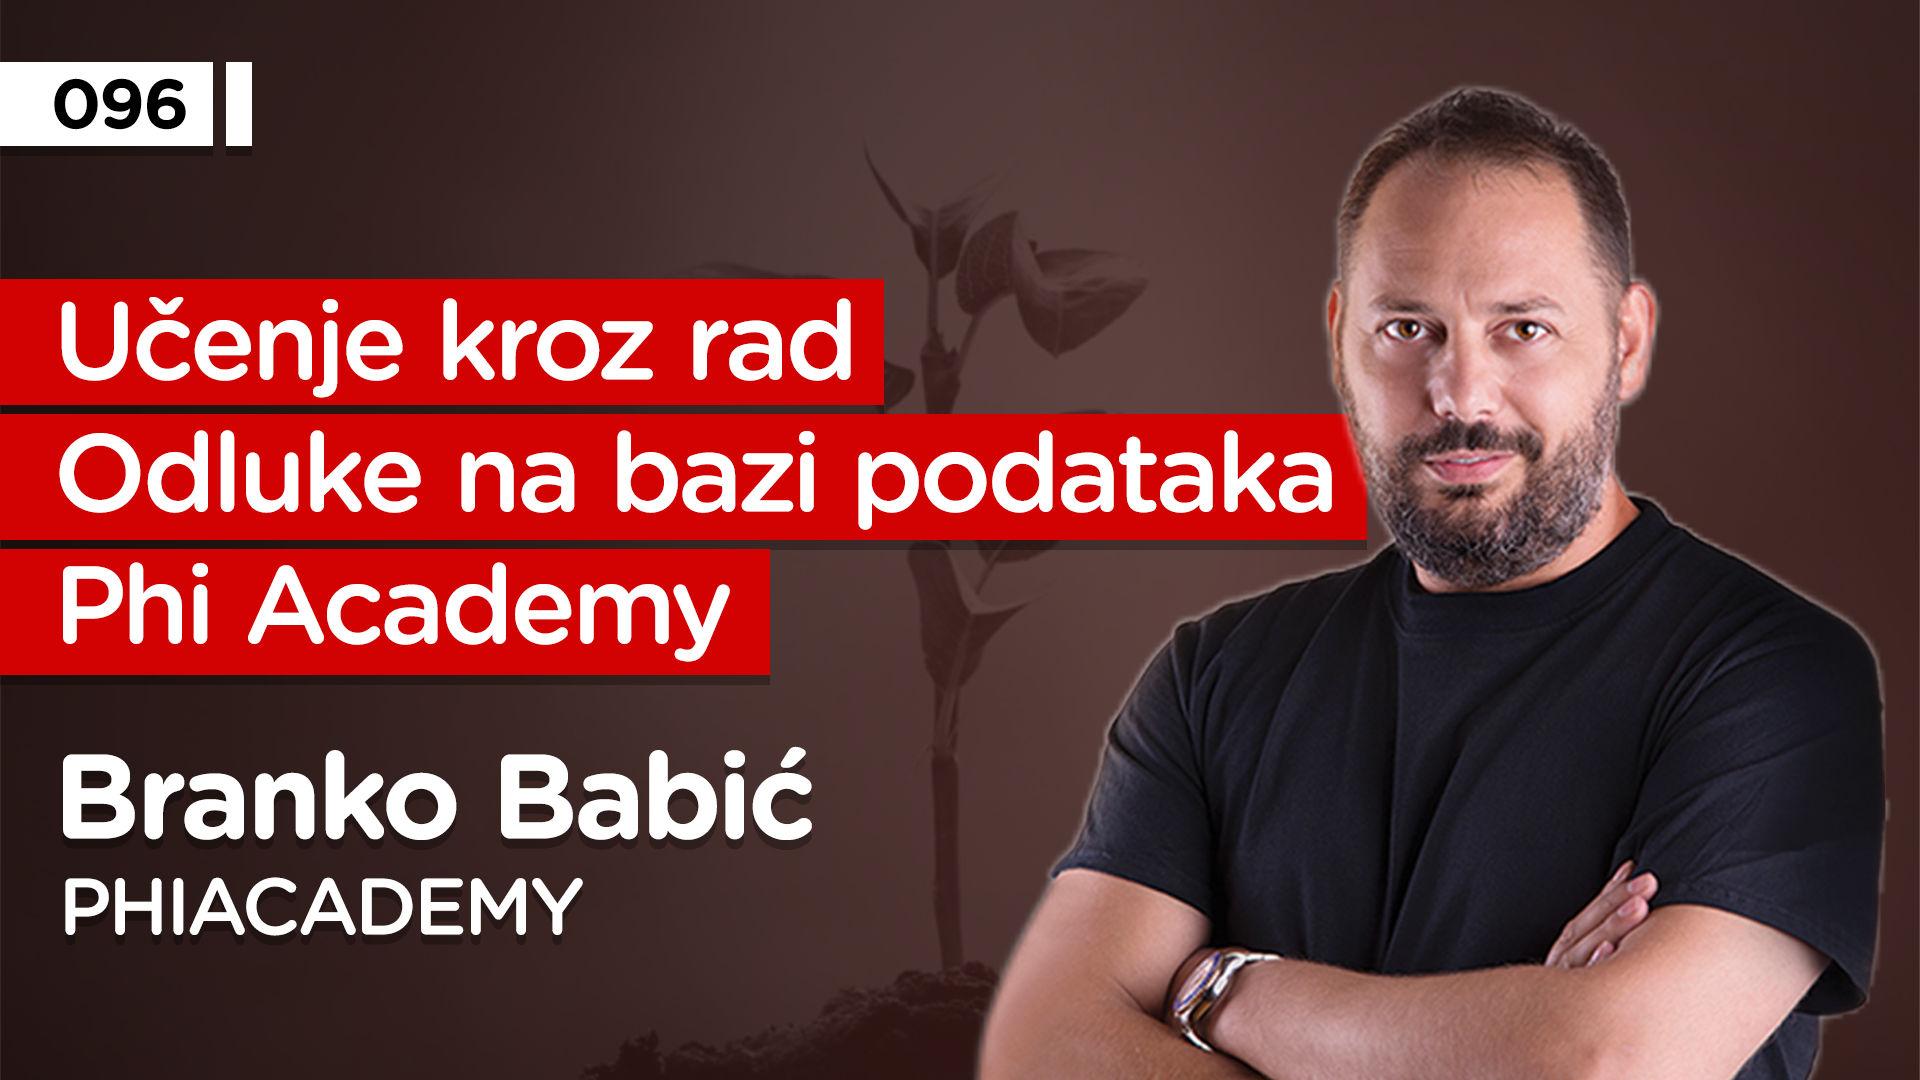 EP096: Branko Babić